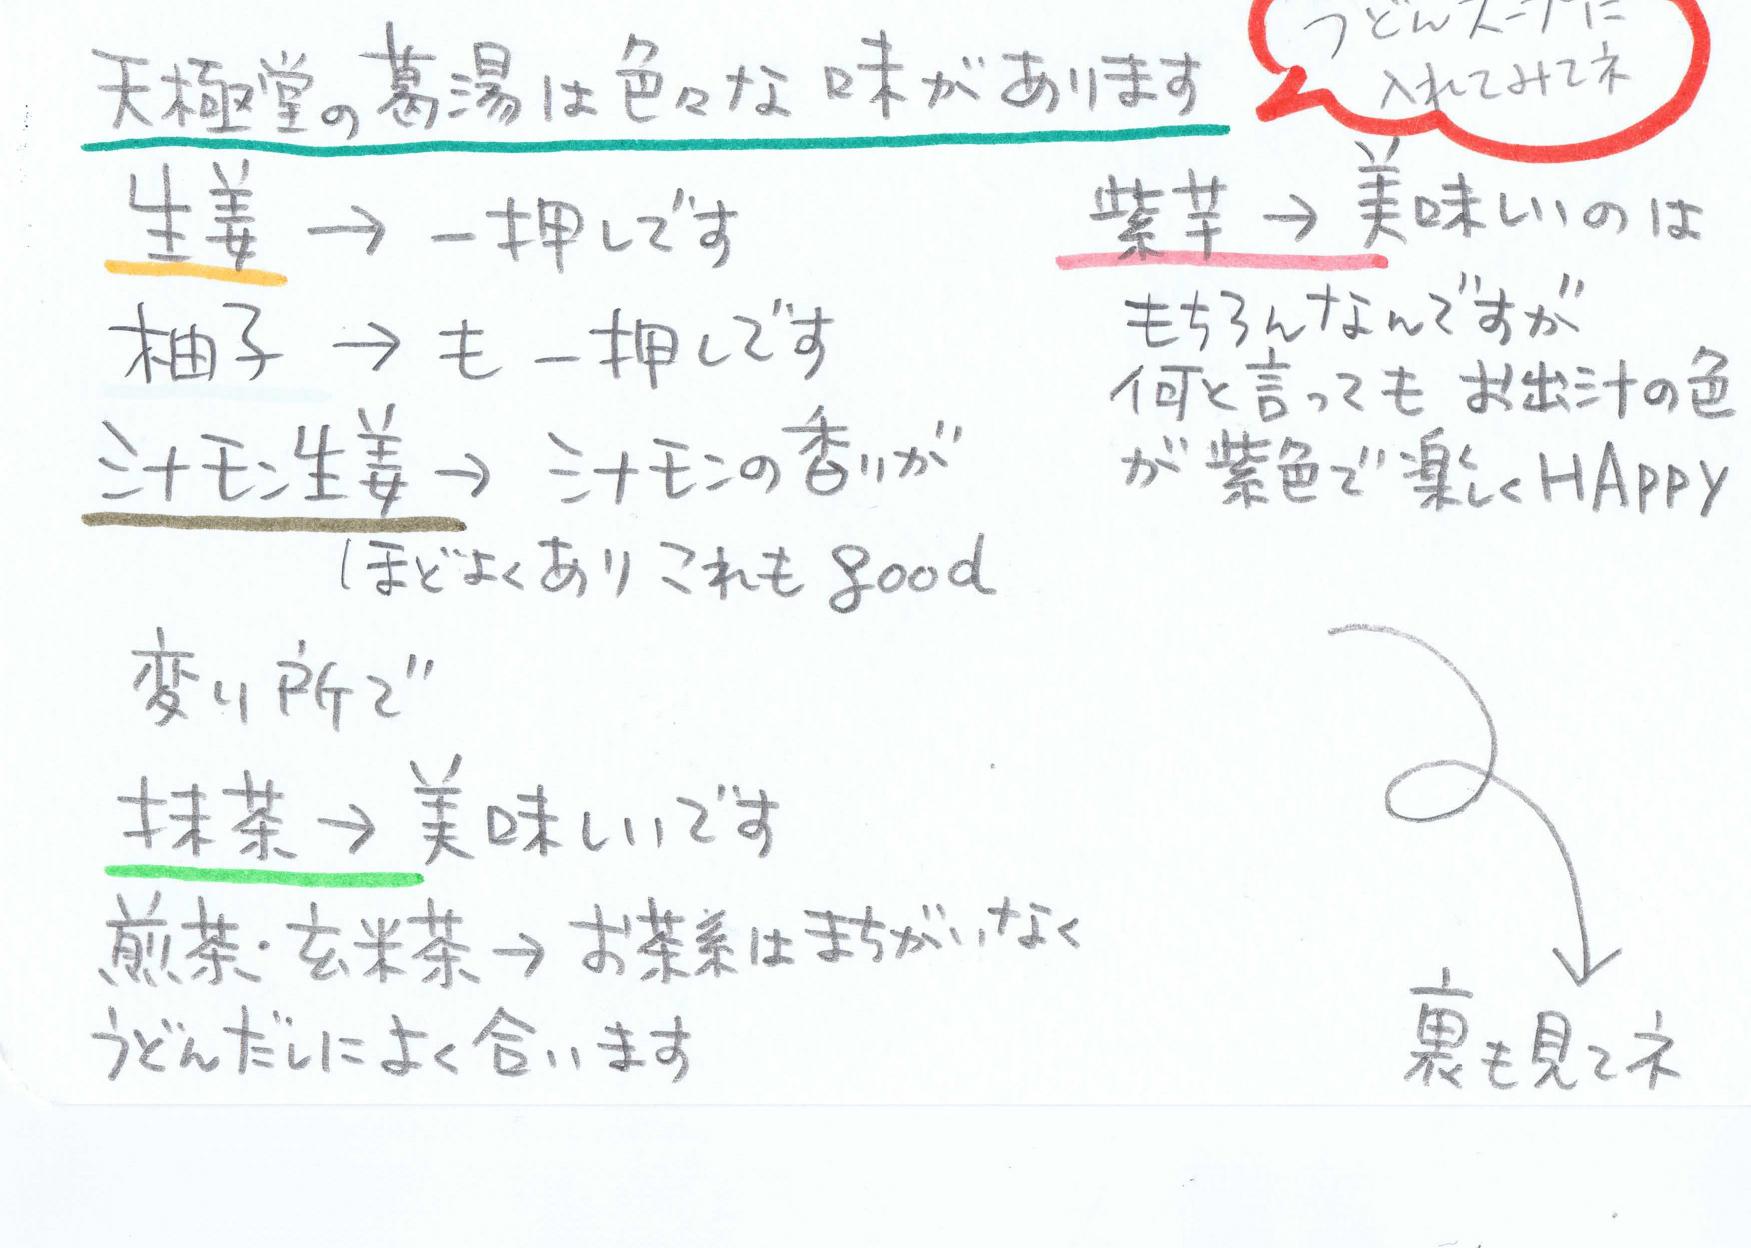 <br /> <b>Warning</b>:  Illegal string offset 'url' in <b>/home/1105575904/kudzu-co-jp/public_html/cp-bin/wordpress5/wp-content/themes/wadax/single-layout/template-2.php</b> on line <b>25</b><br />